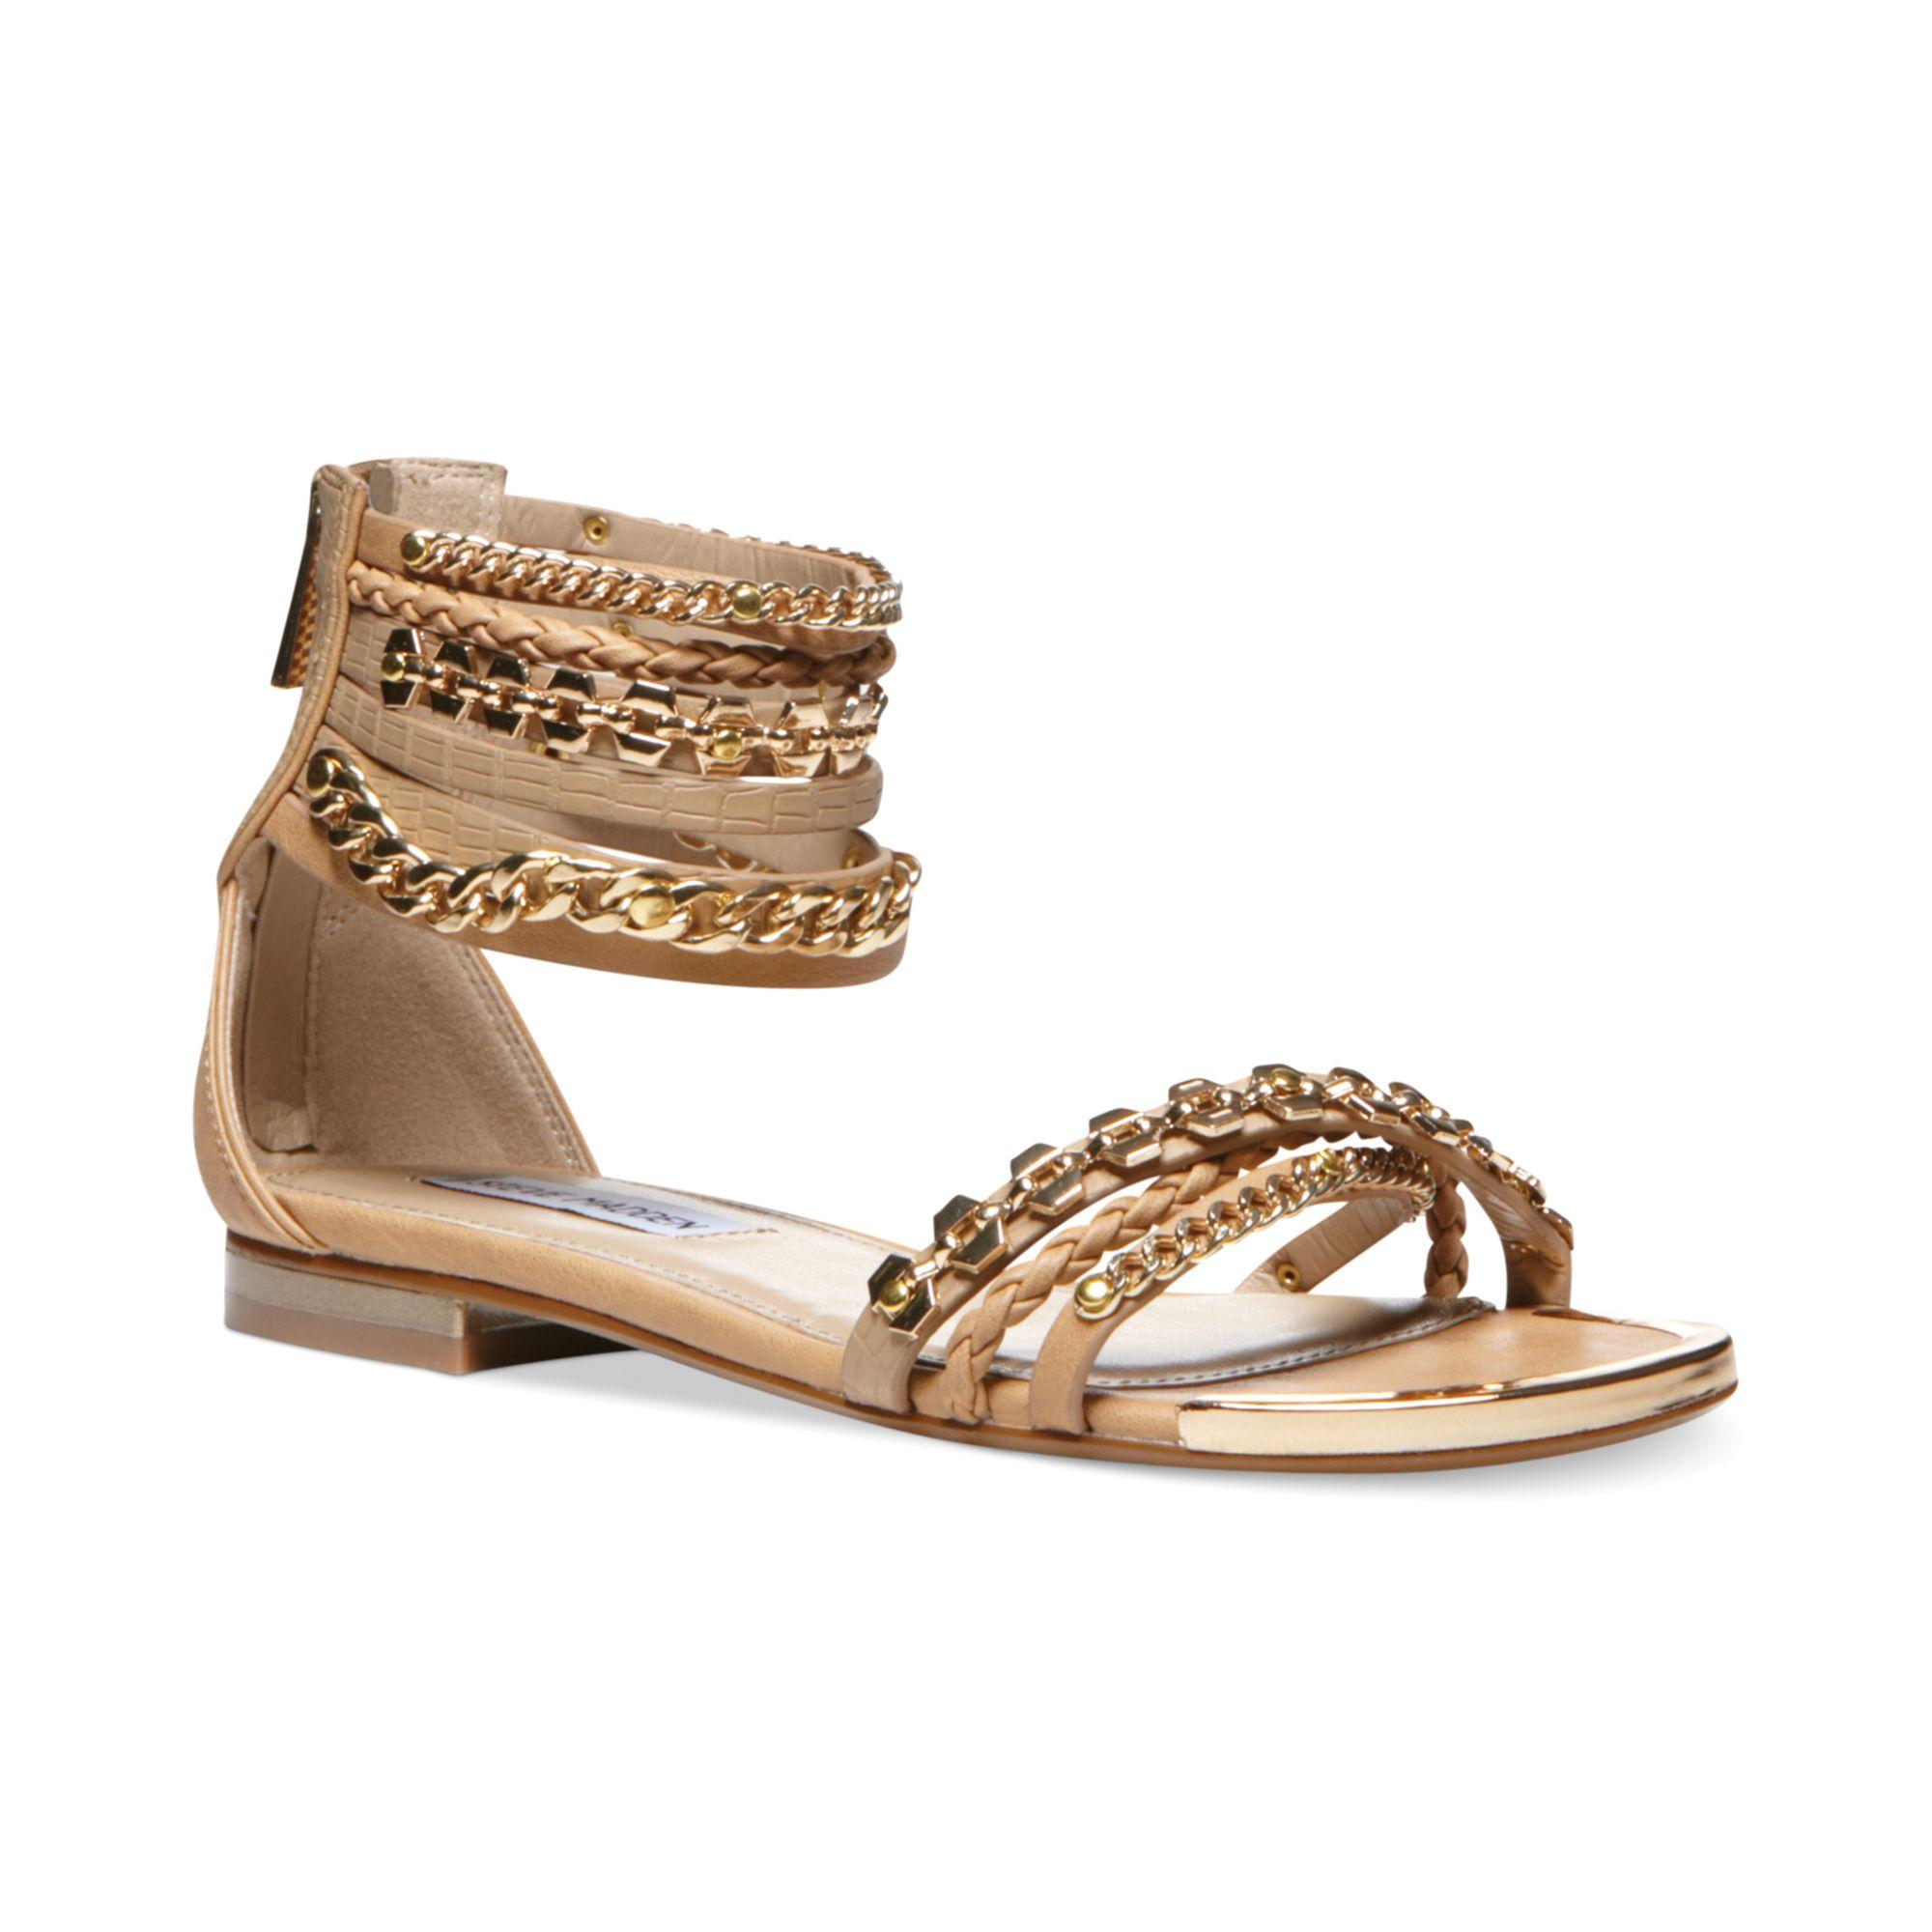 Lyst - Steve Madden Womens Lawful Flat Sandals in Metallic